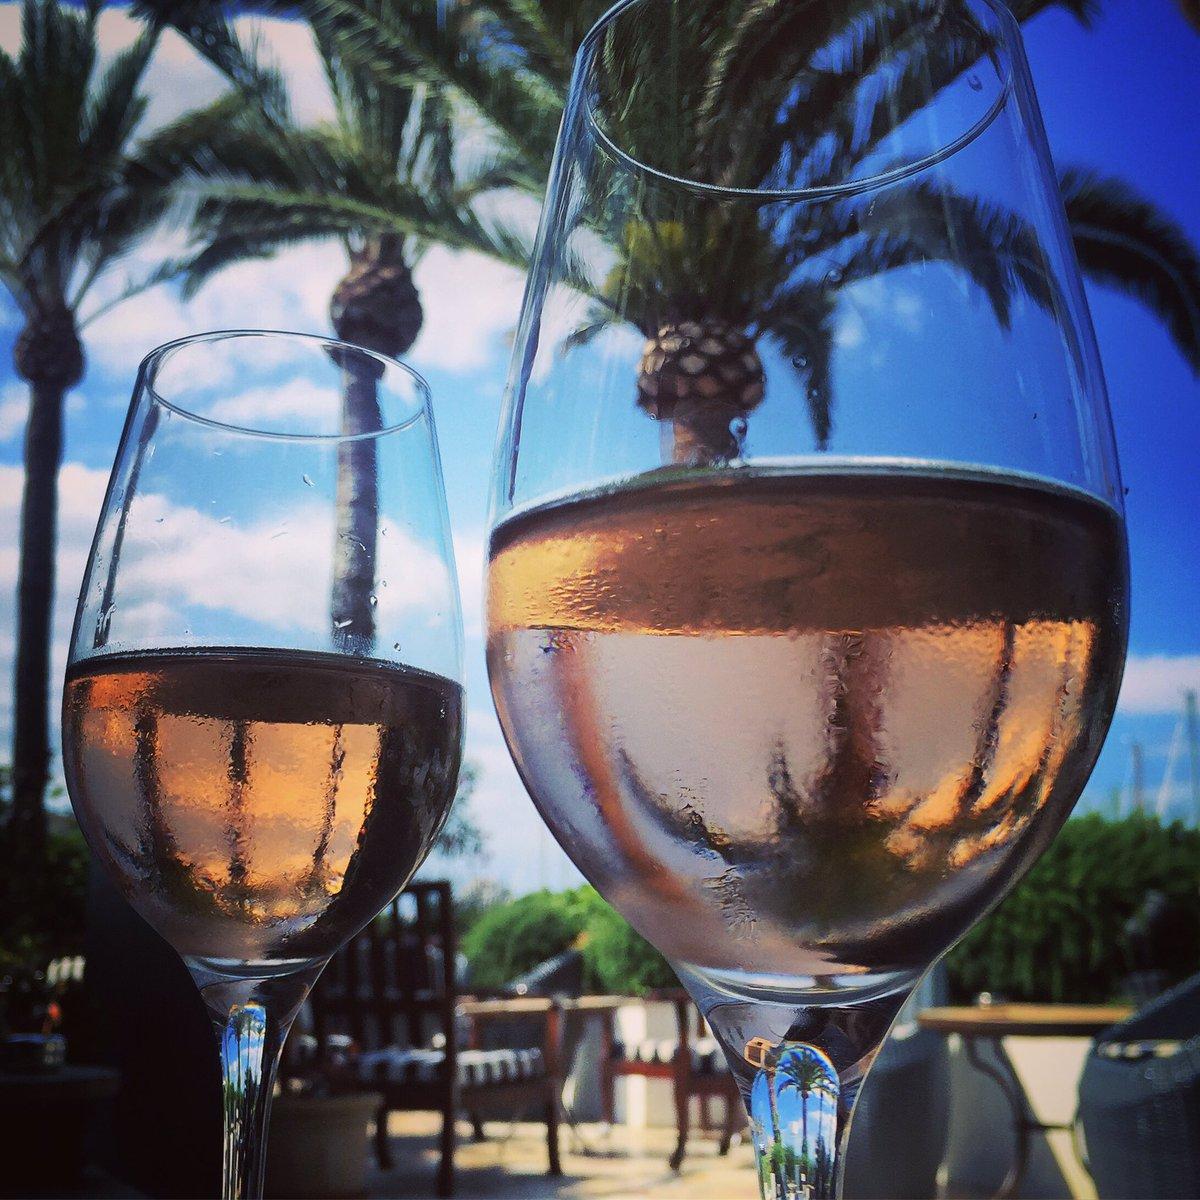 Raising a last glass to @Scott_Solder and Richard! Farewell Majorca #wine #SolderNorrisWedding #rosado #winetravel #Portixol #wine #rosé<br>http://pic.twitter.com/thvQ8az6WV